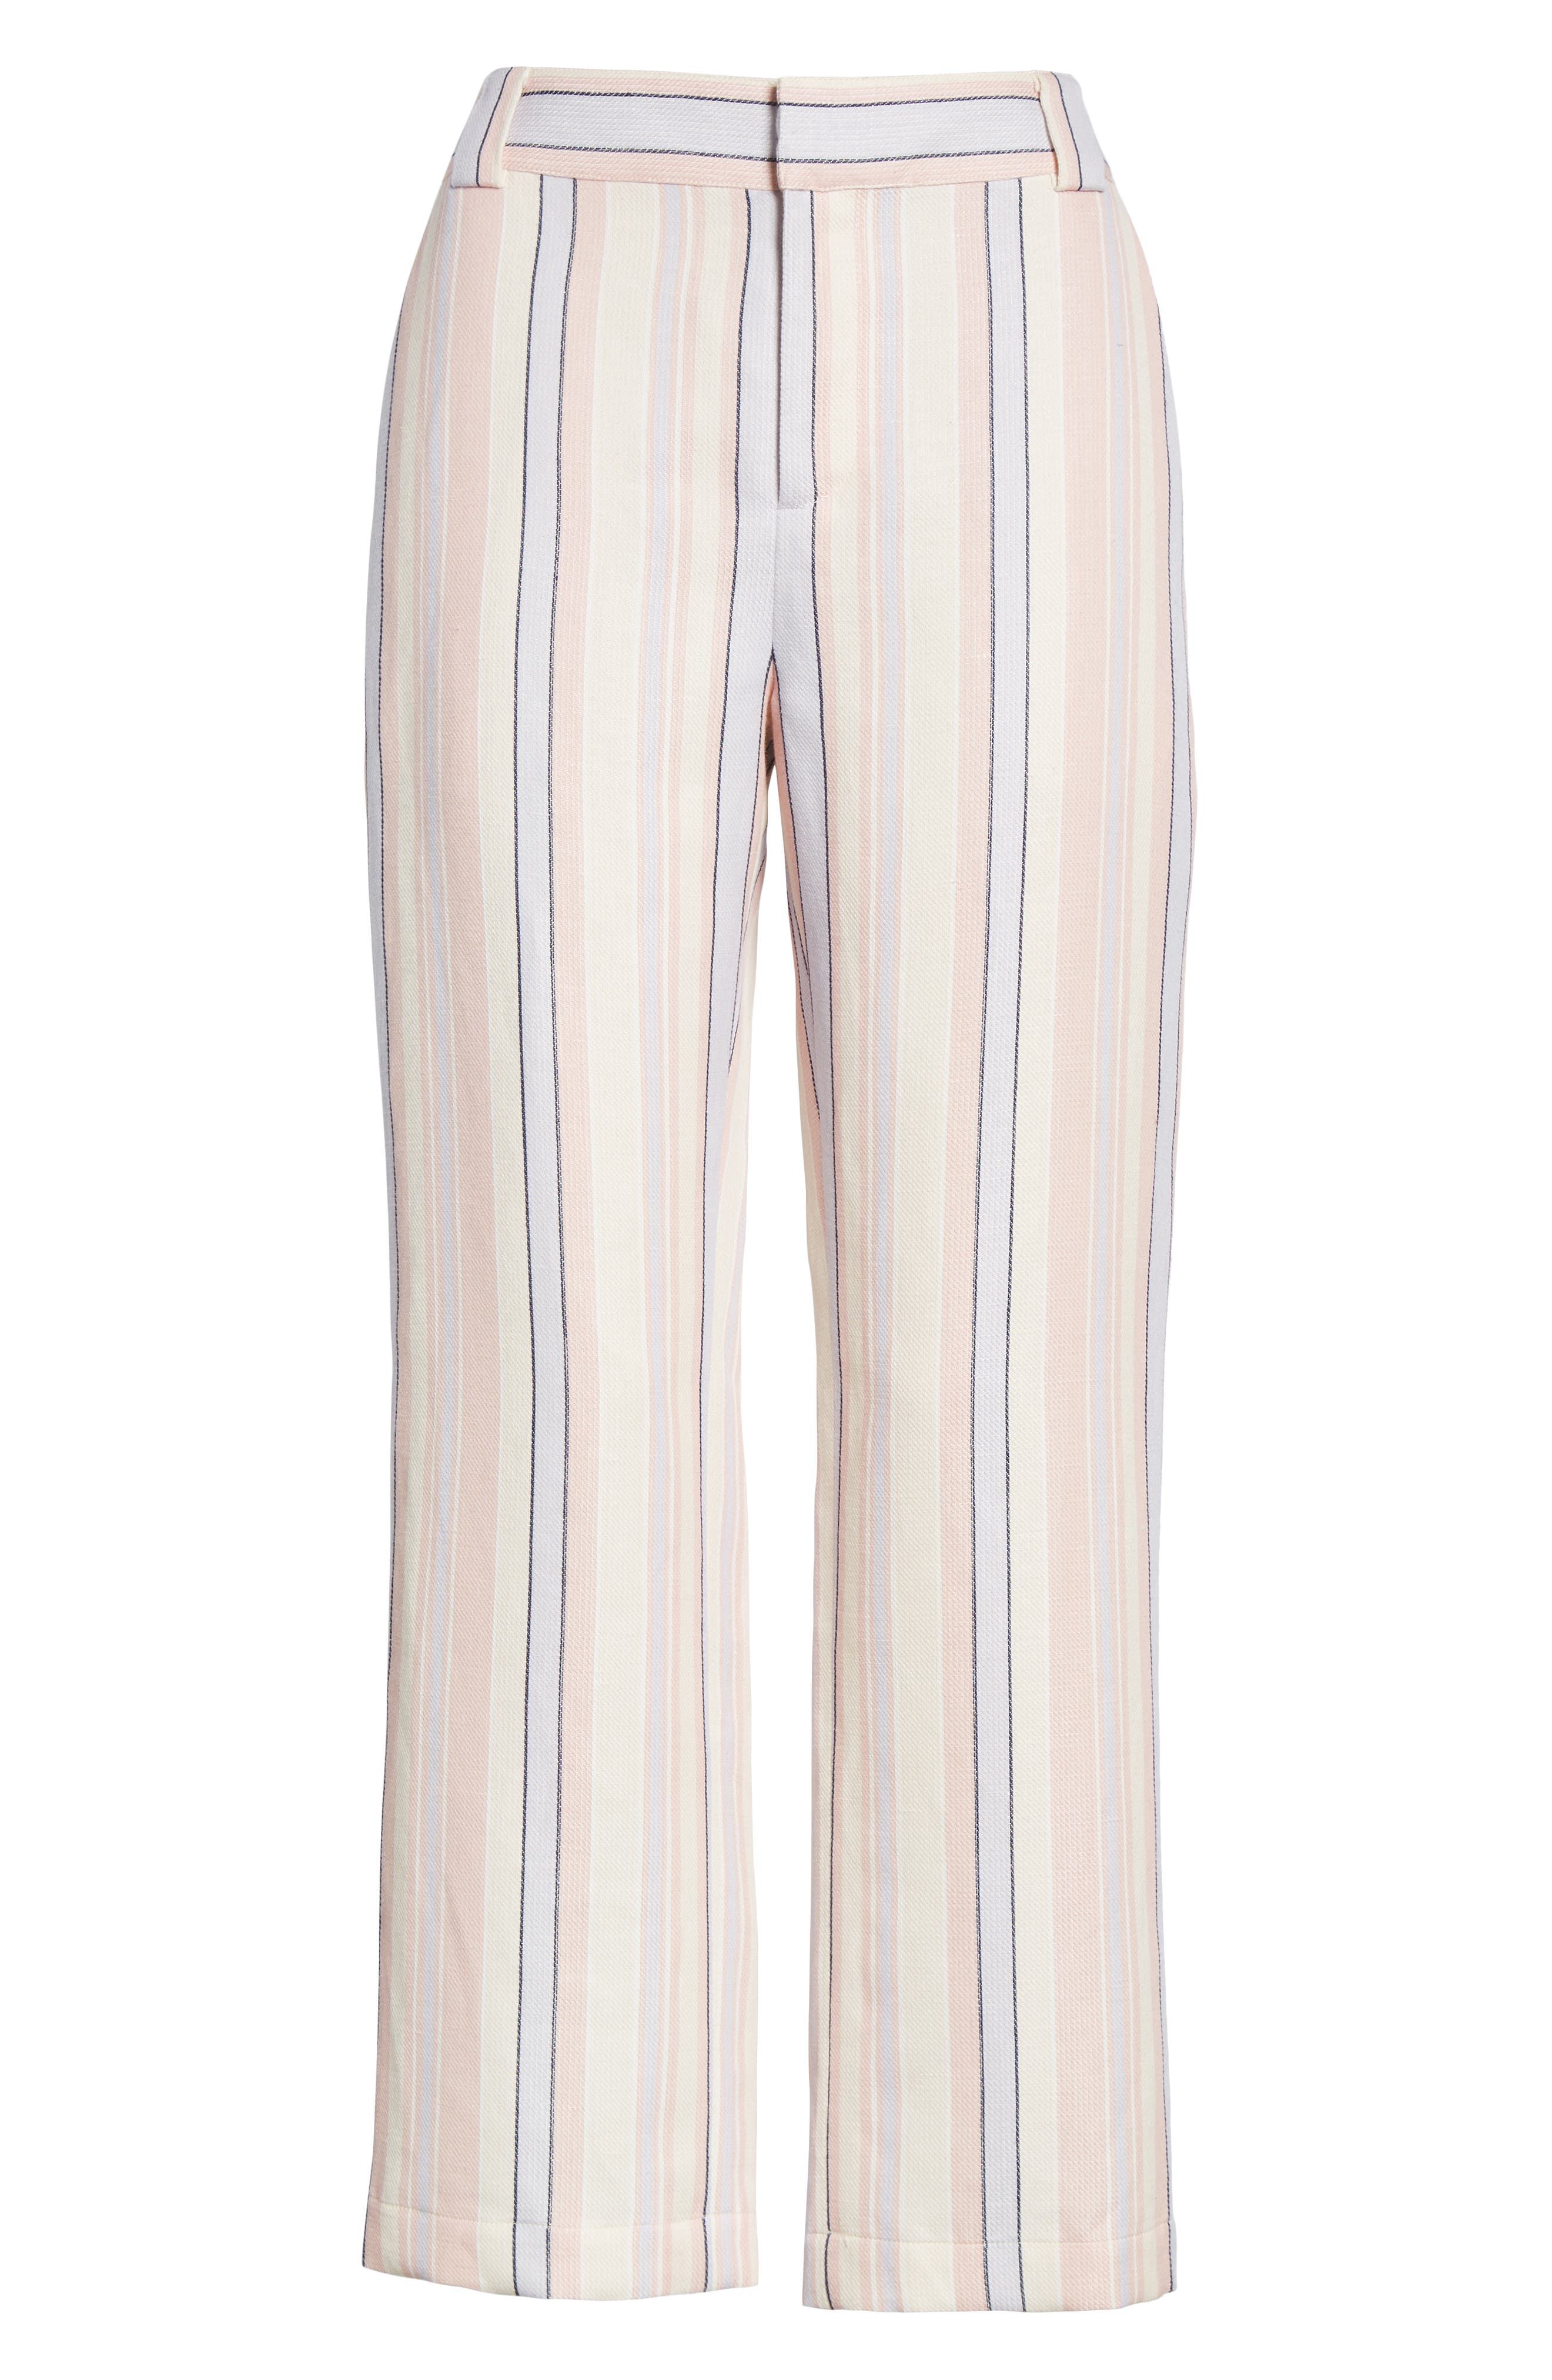 Ginger Stripe Pants,                             Alternate thumbnail 7, color,                             MULTI